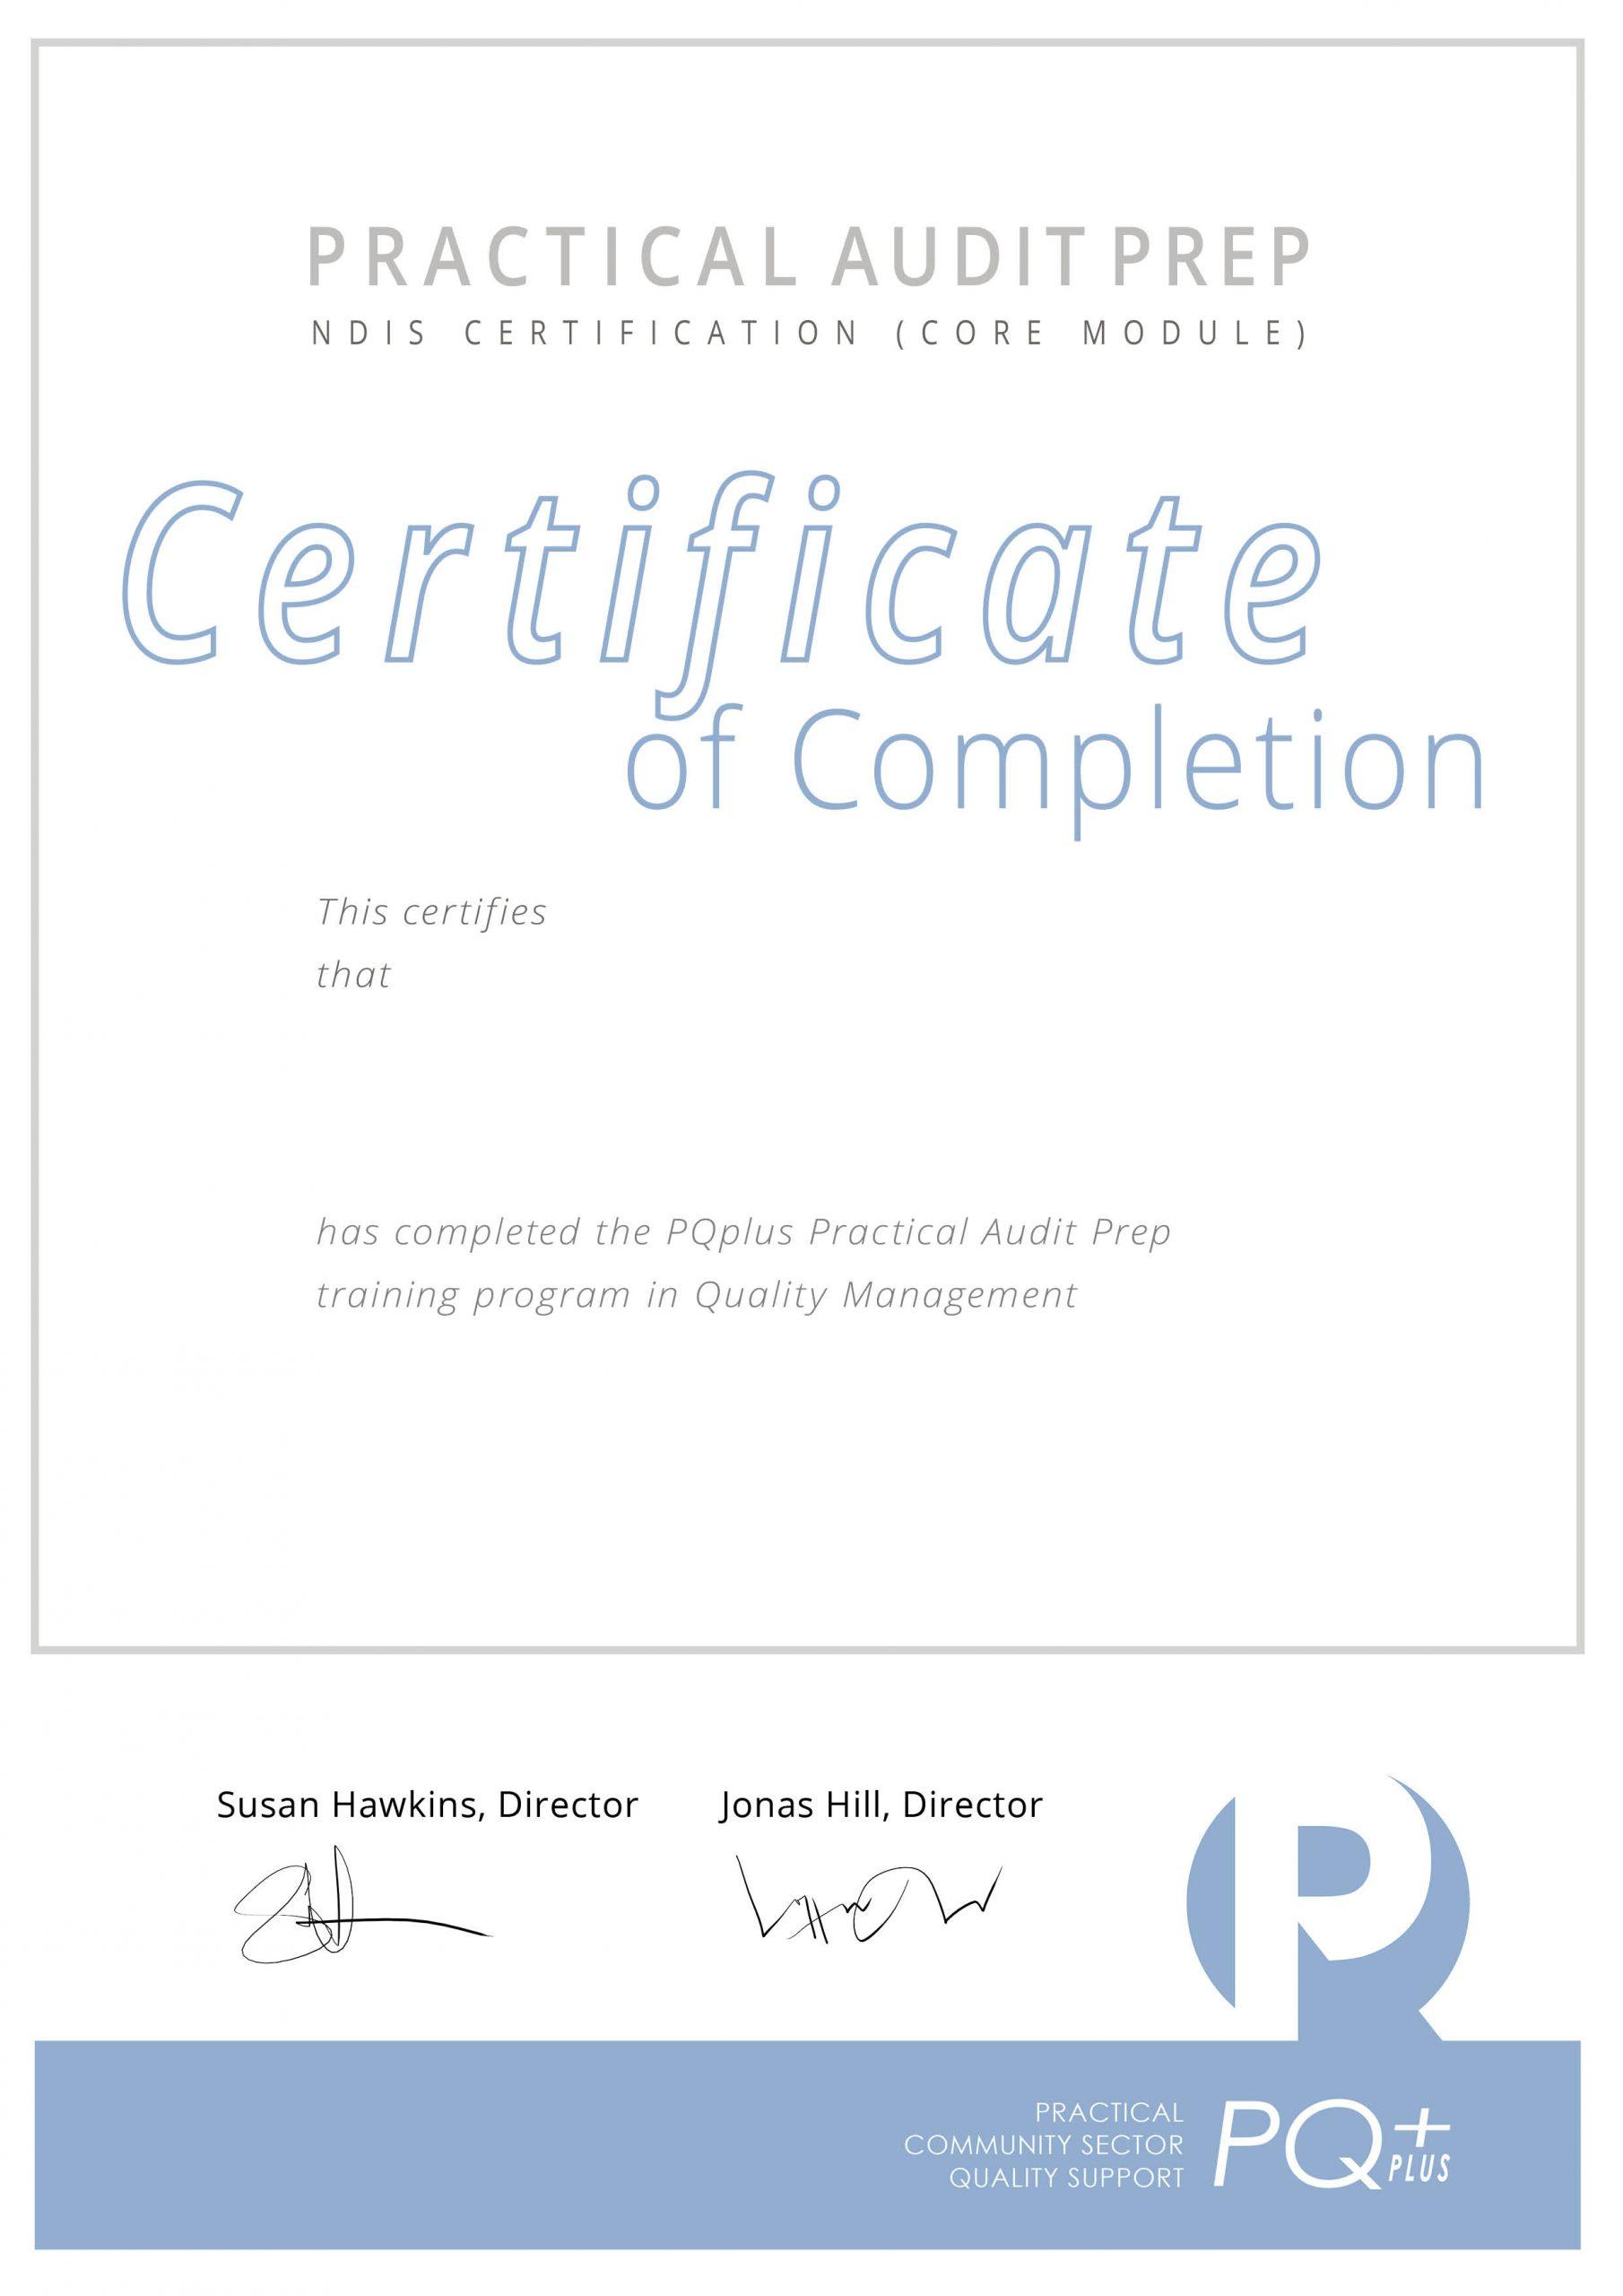 Practical Audit Prep Certificate